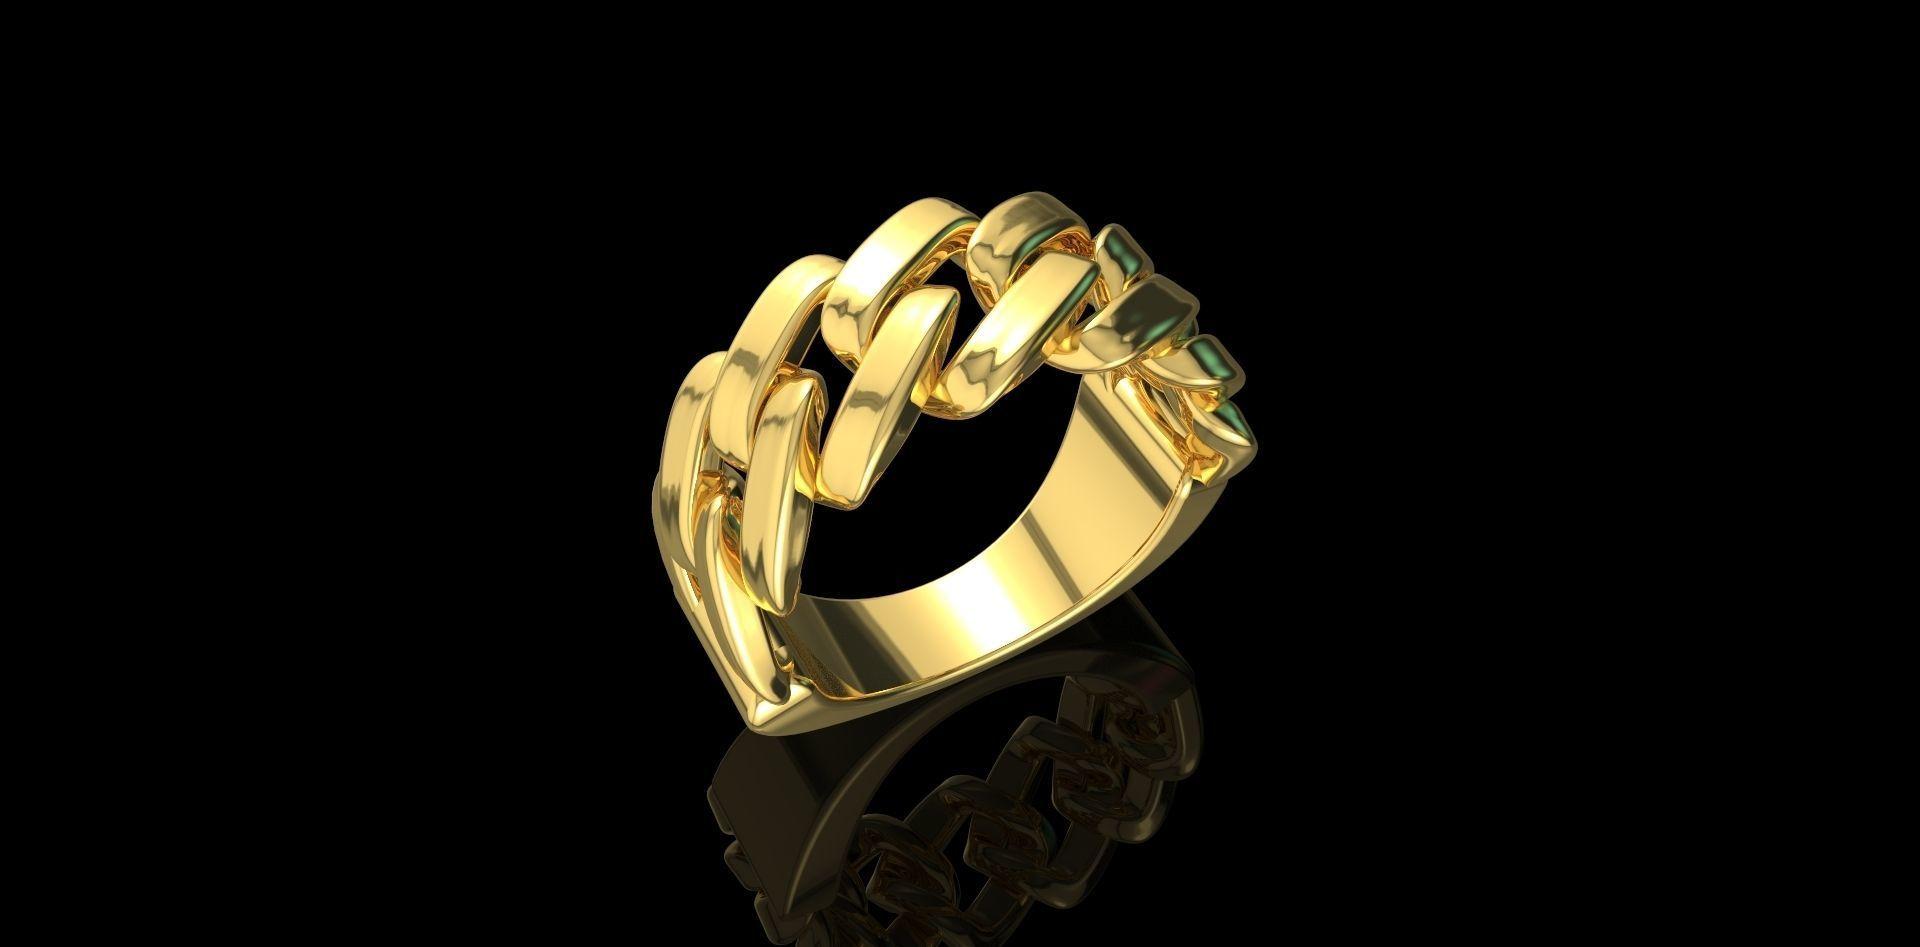 Gold N840